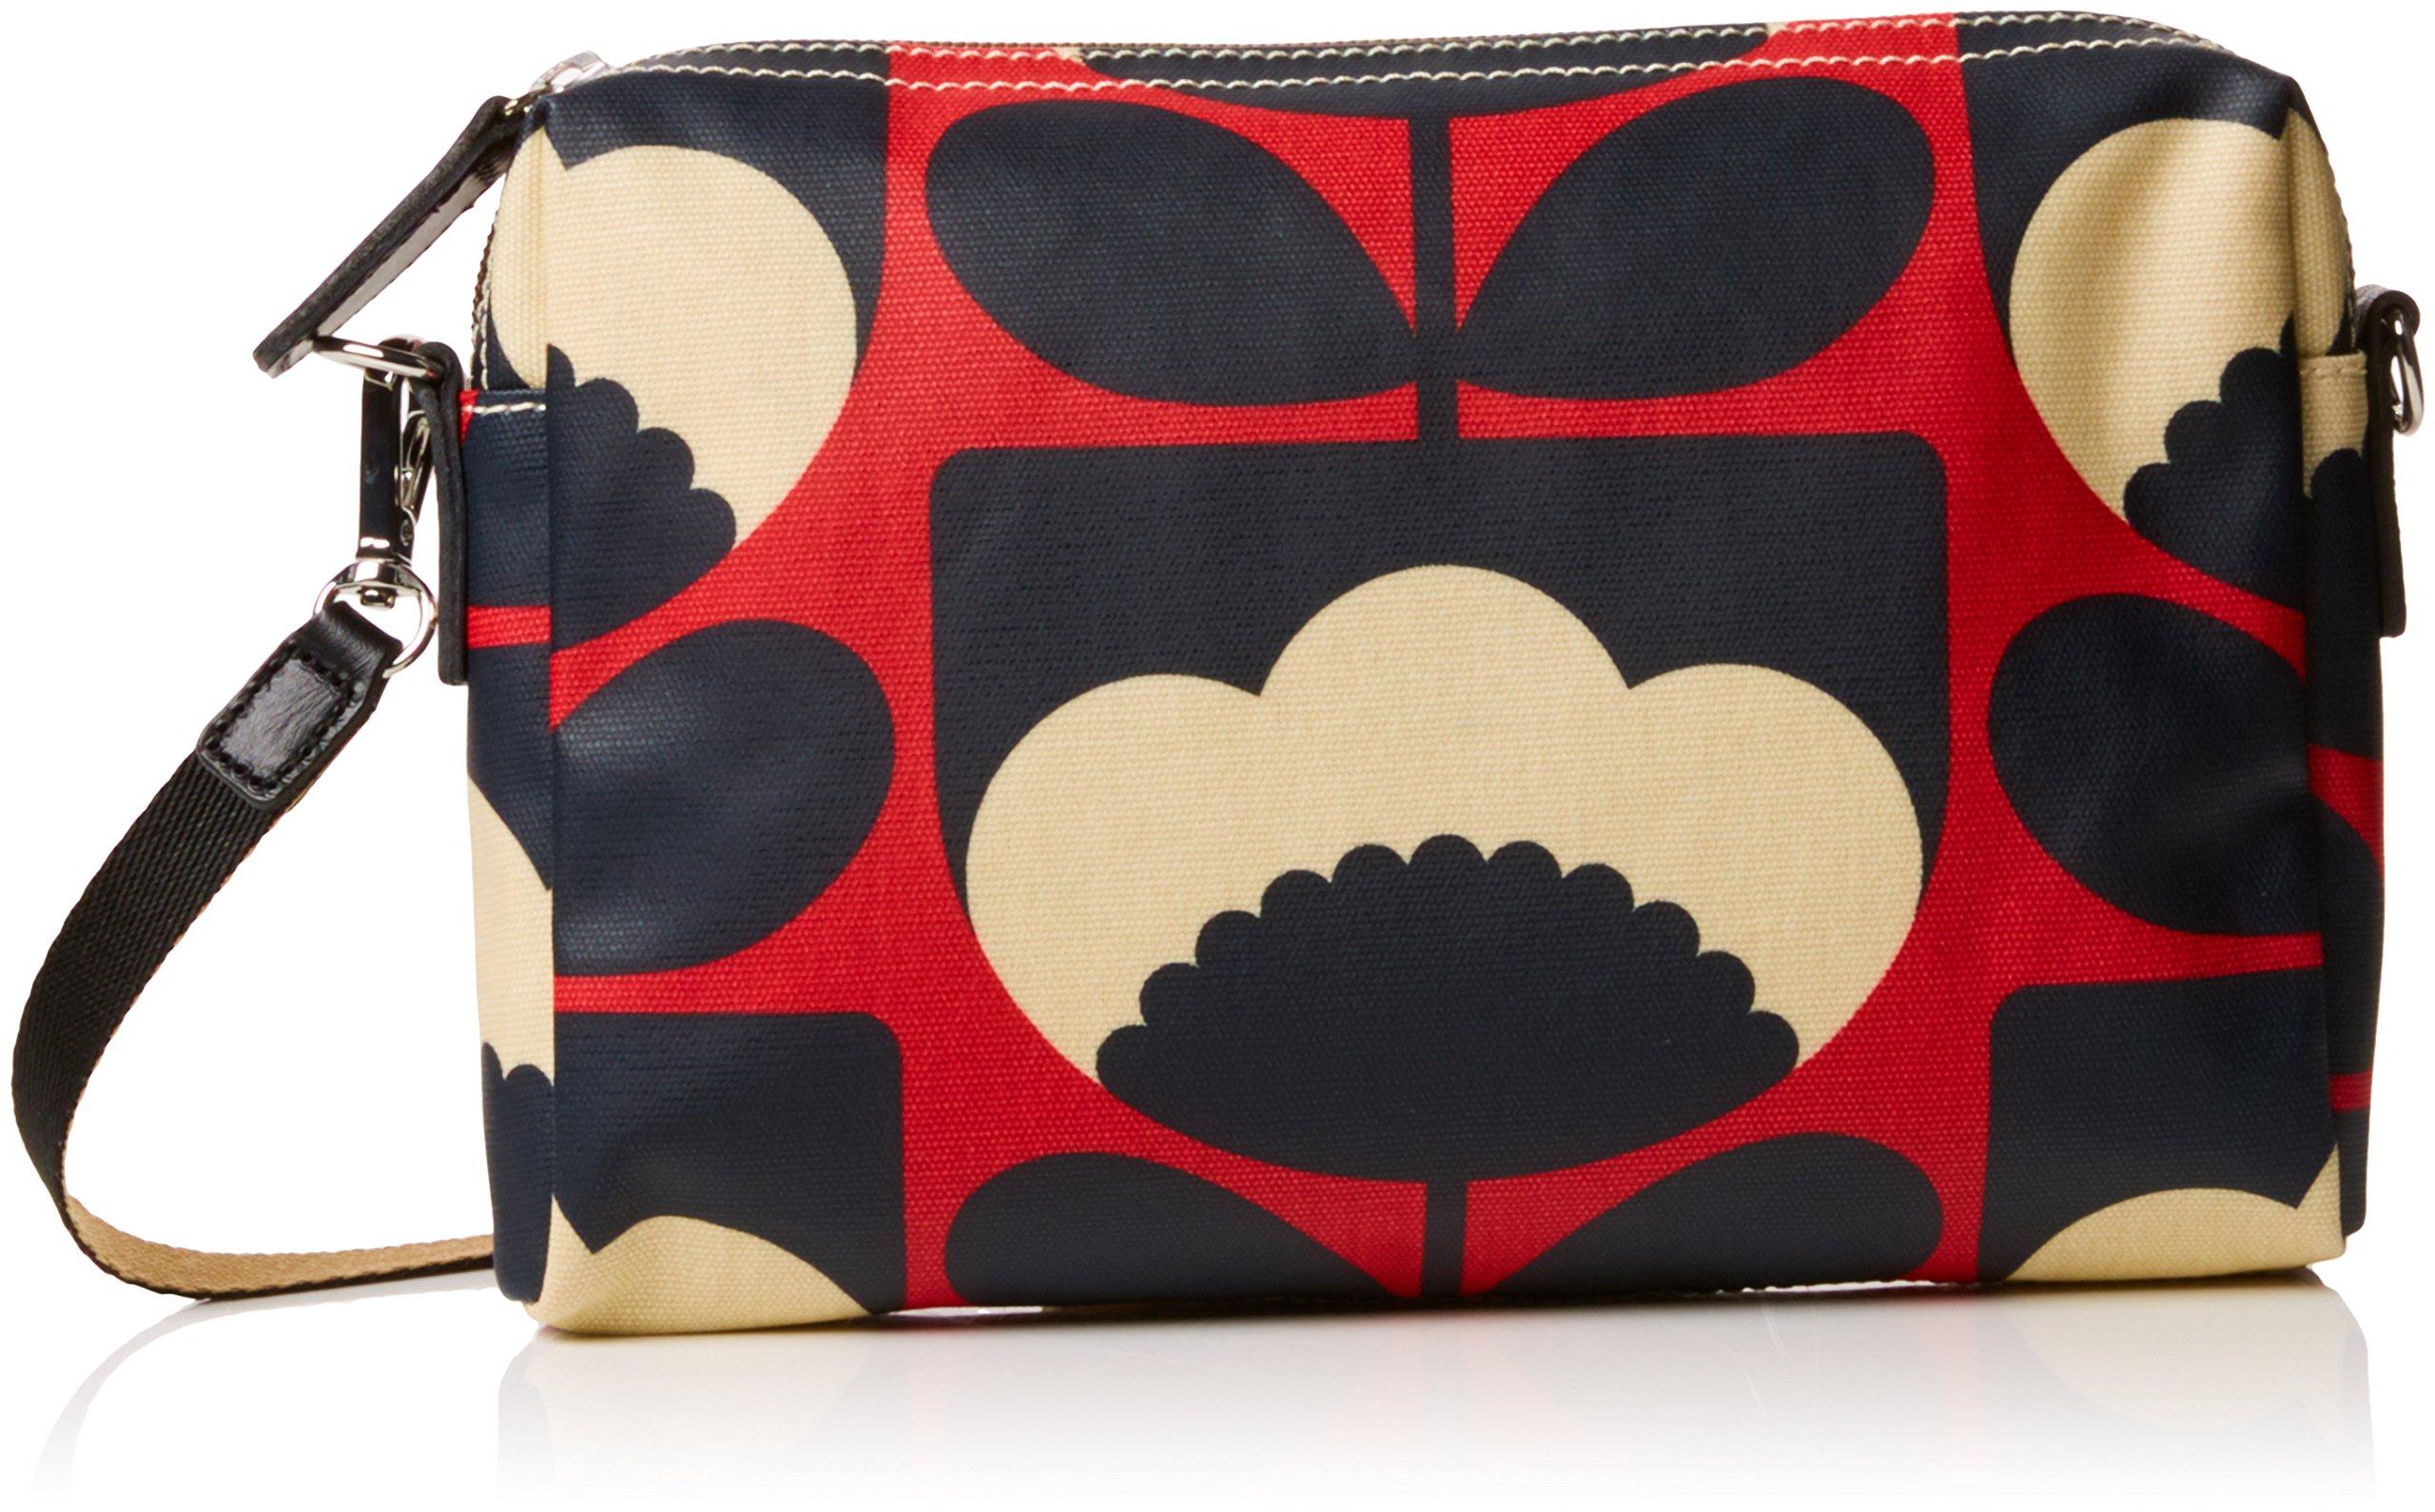 Orla Kiely Spring Bloom Small Cross Body Bag, Poppy